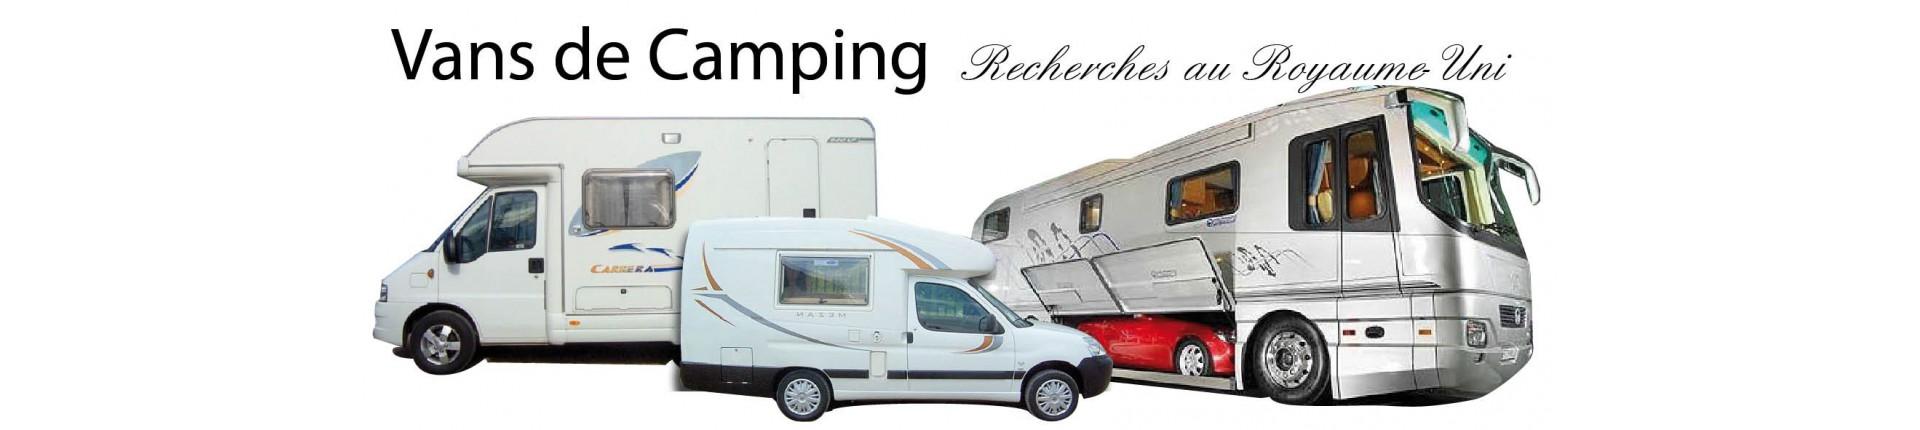 Vans Camping